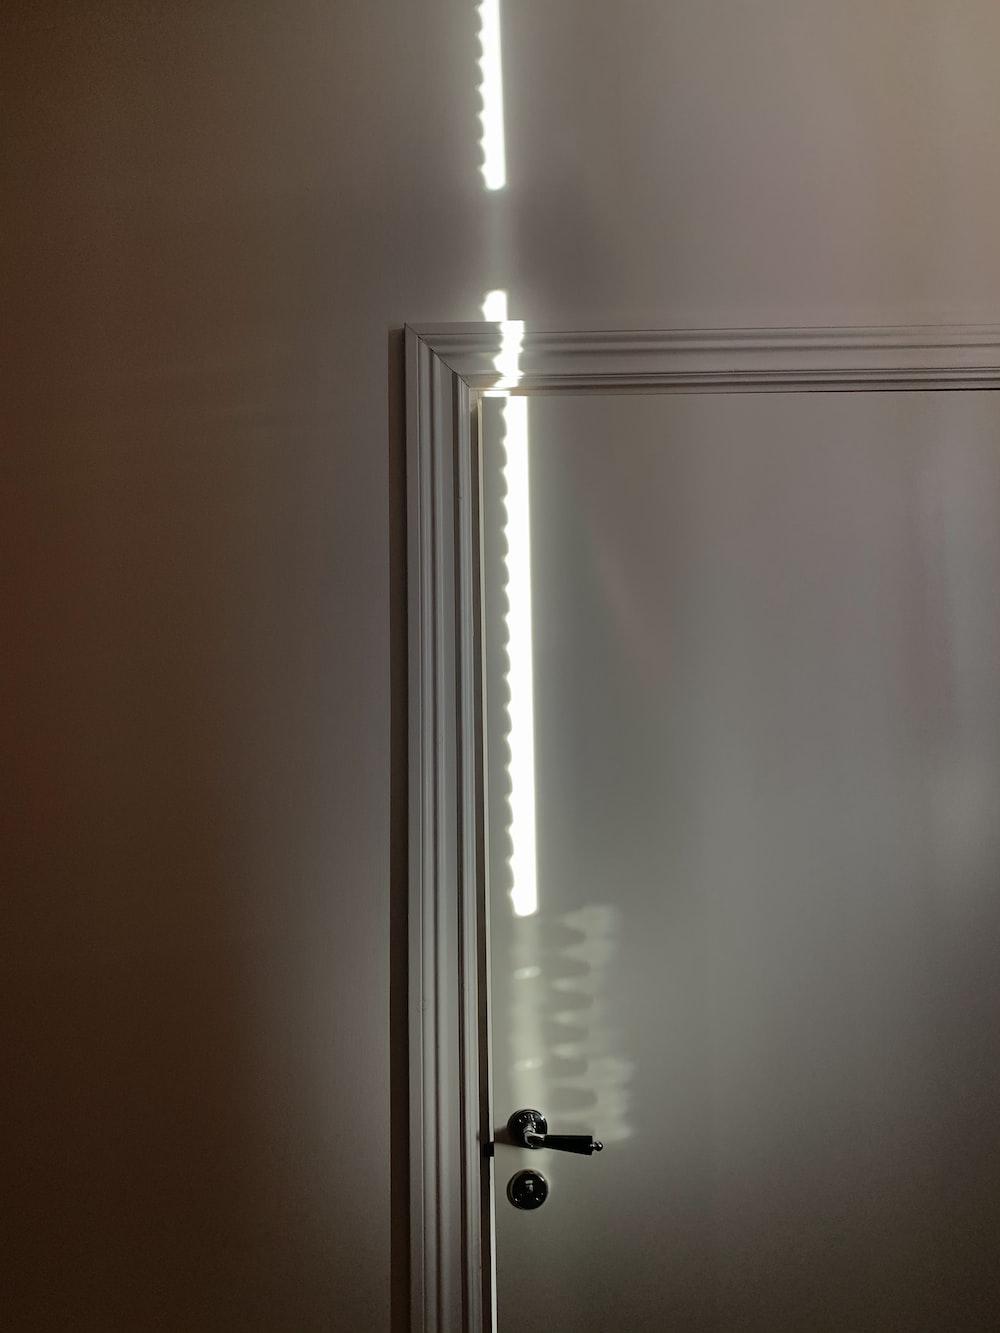 white window curtain on white window